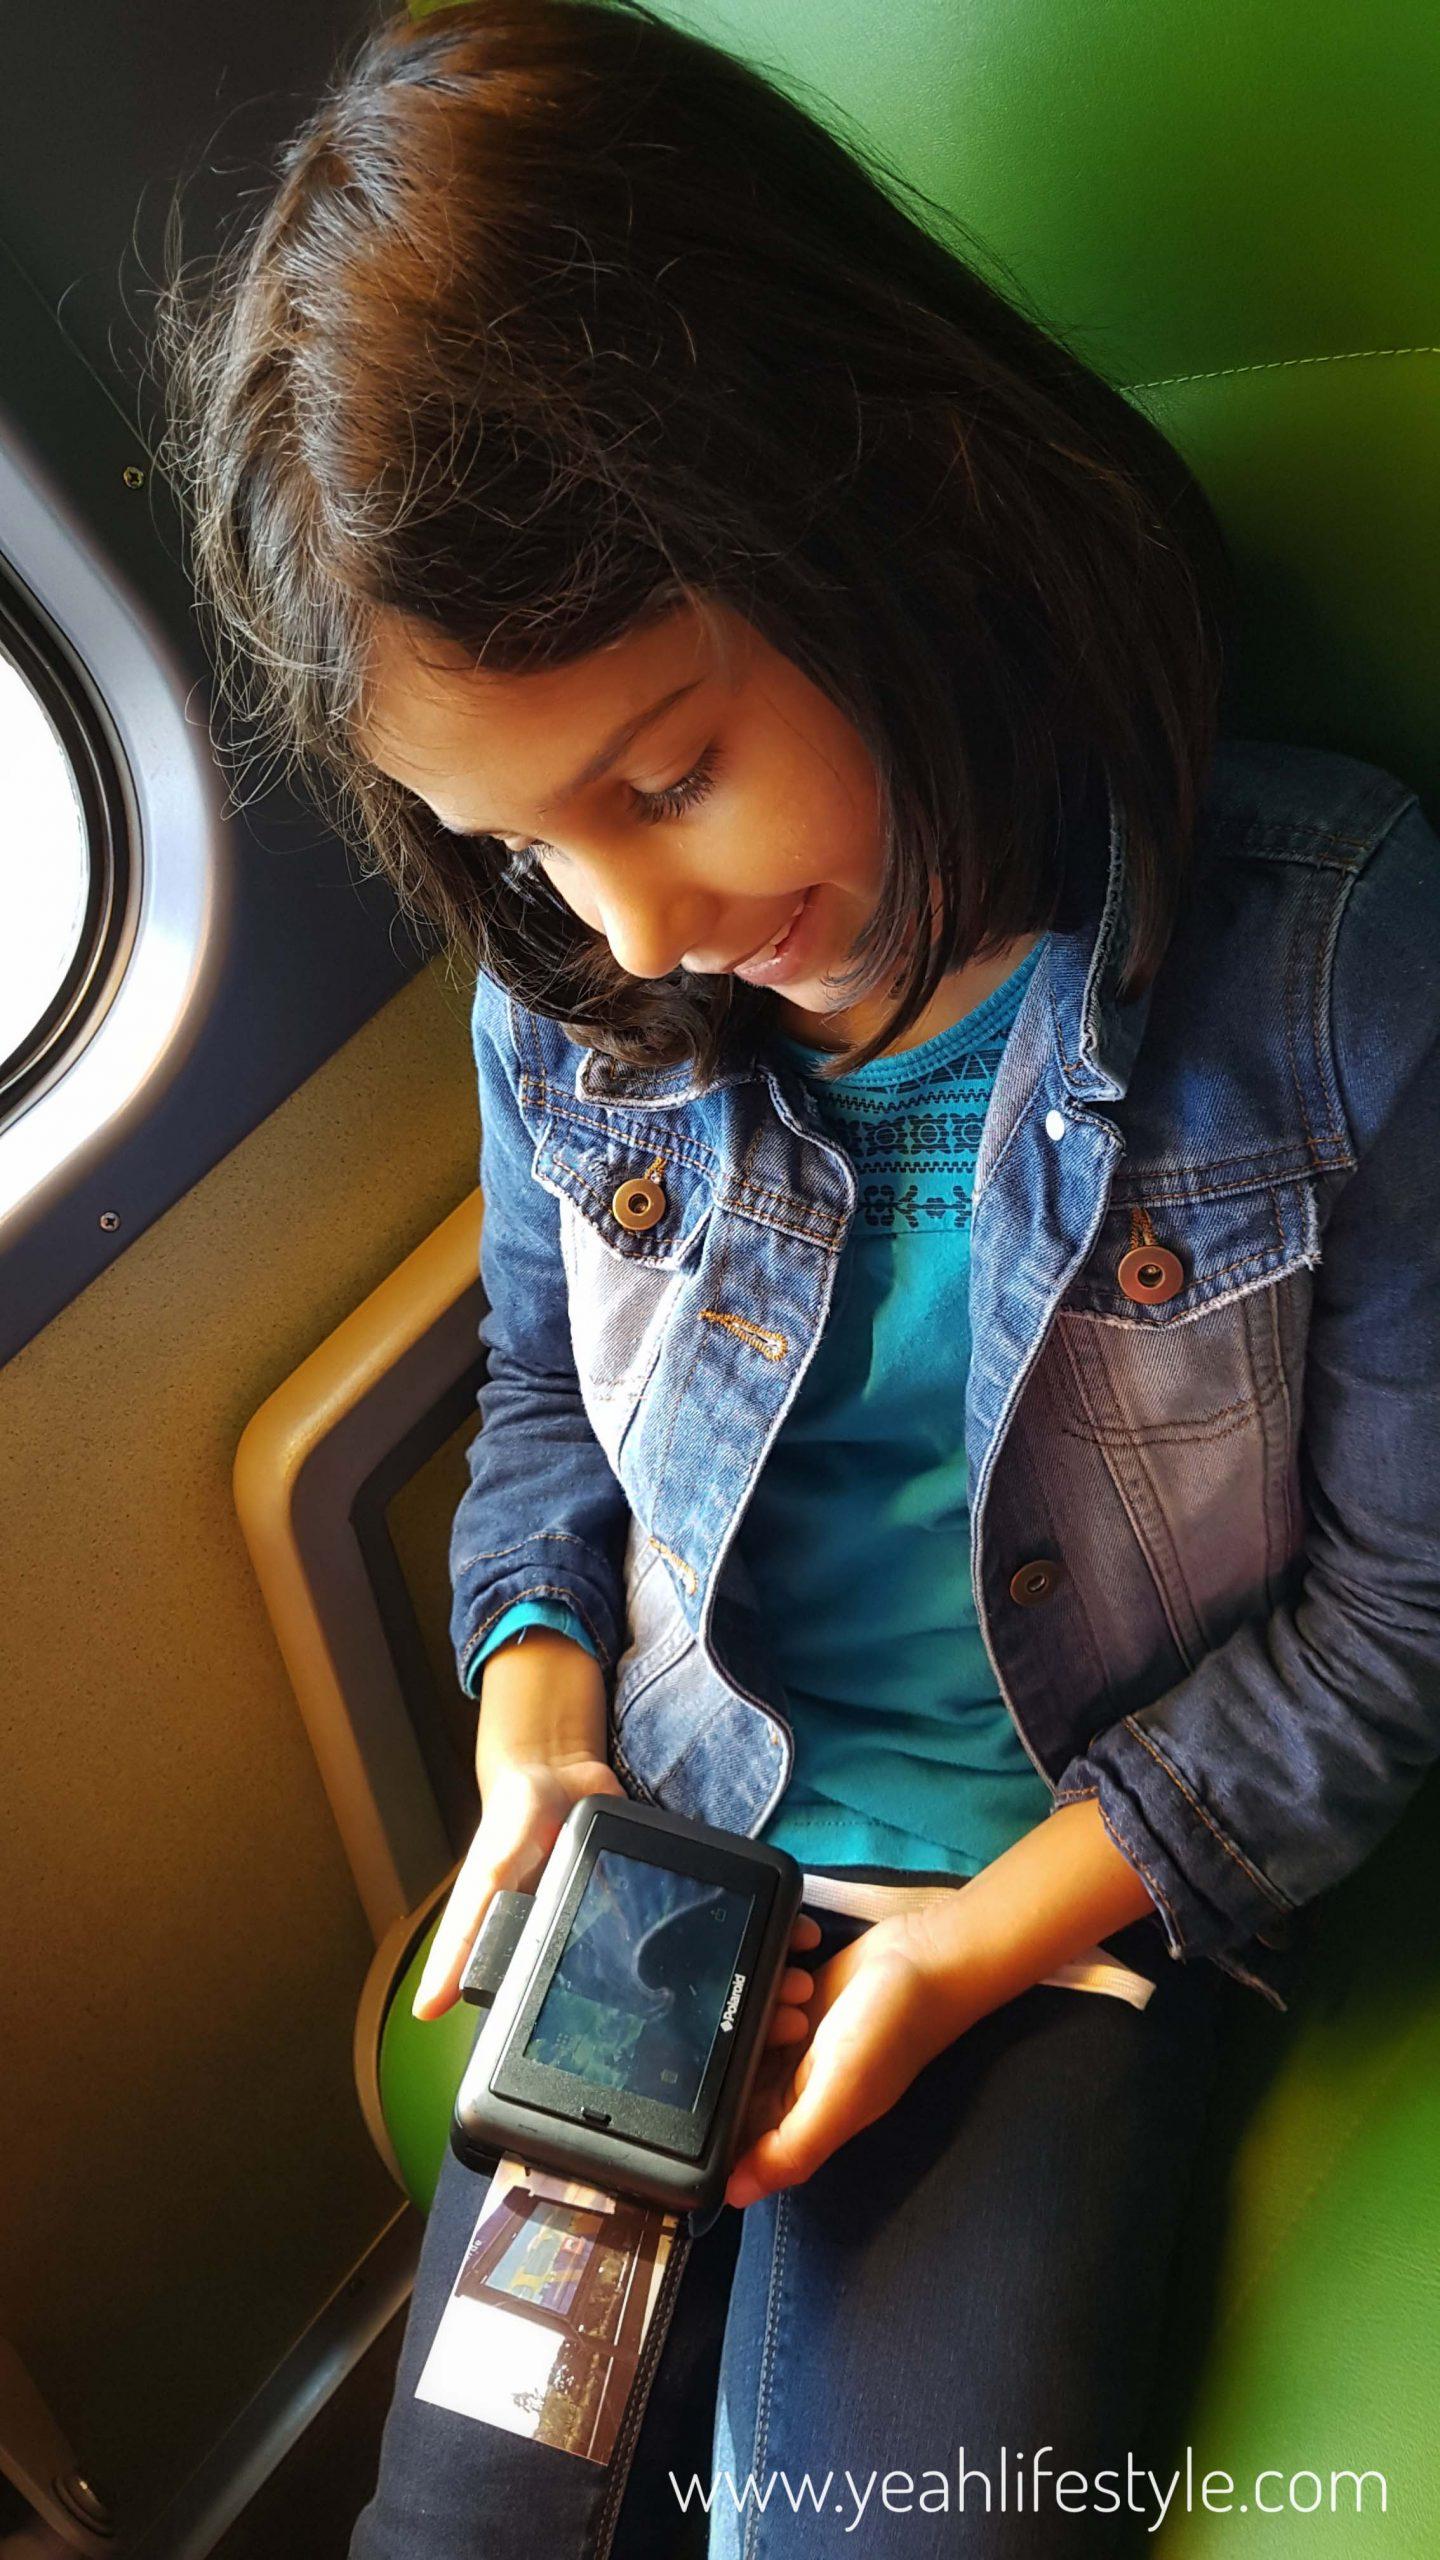 polaroid-snap-touch-camera-tech-blogger-review-uk-print